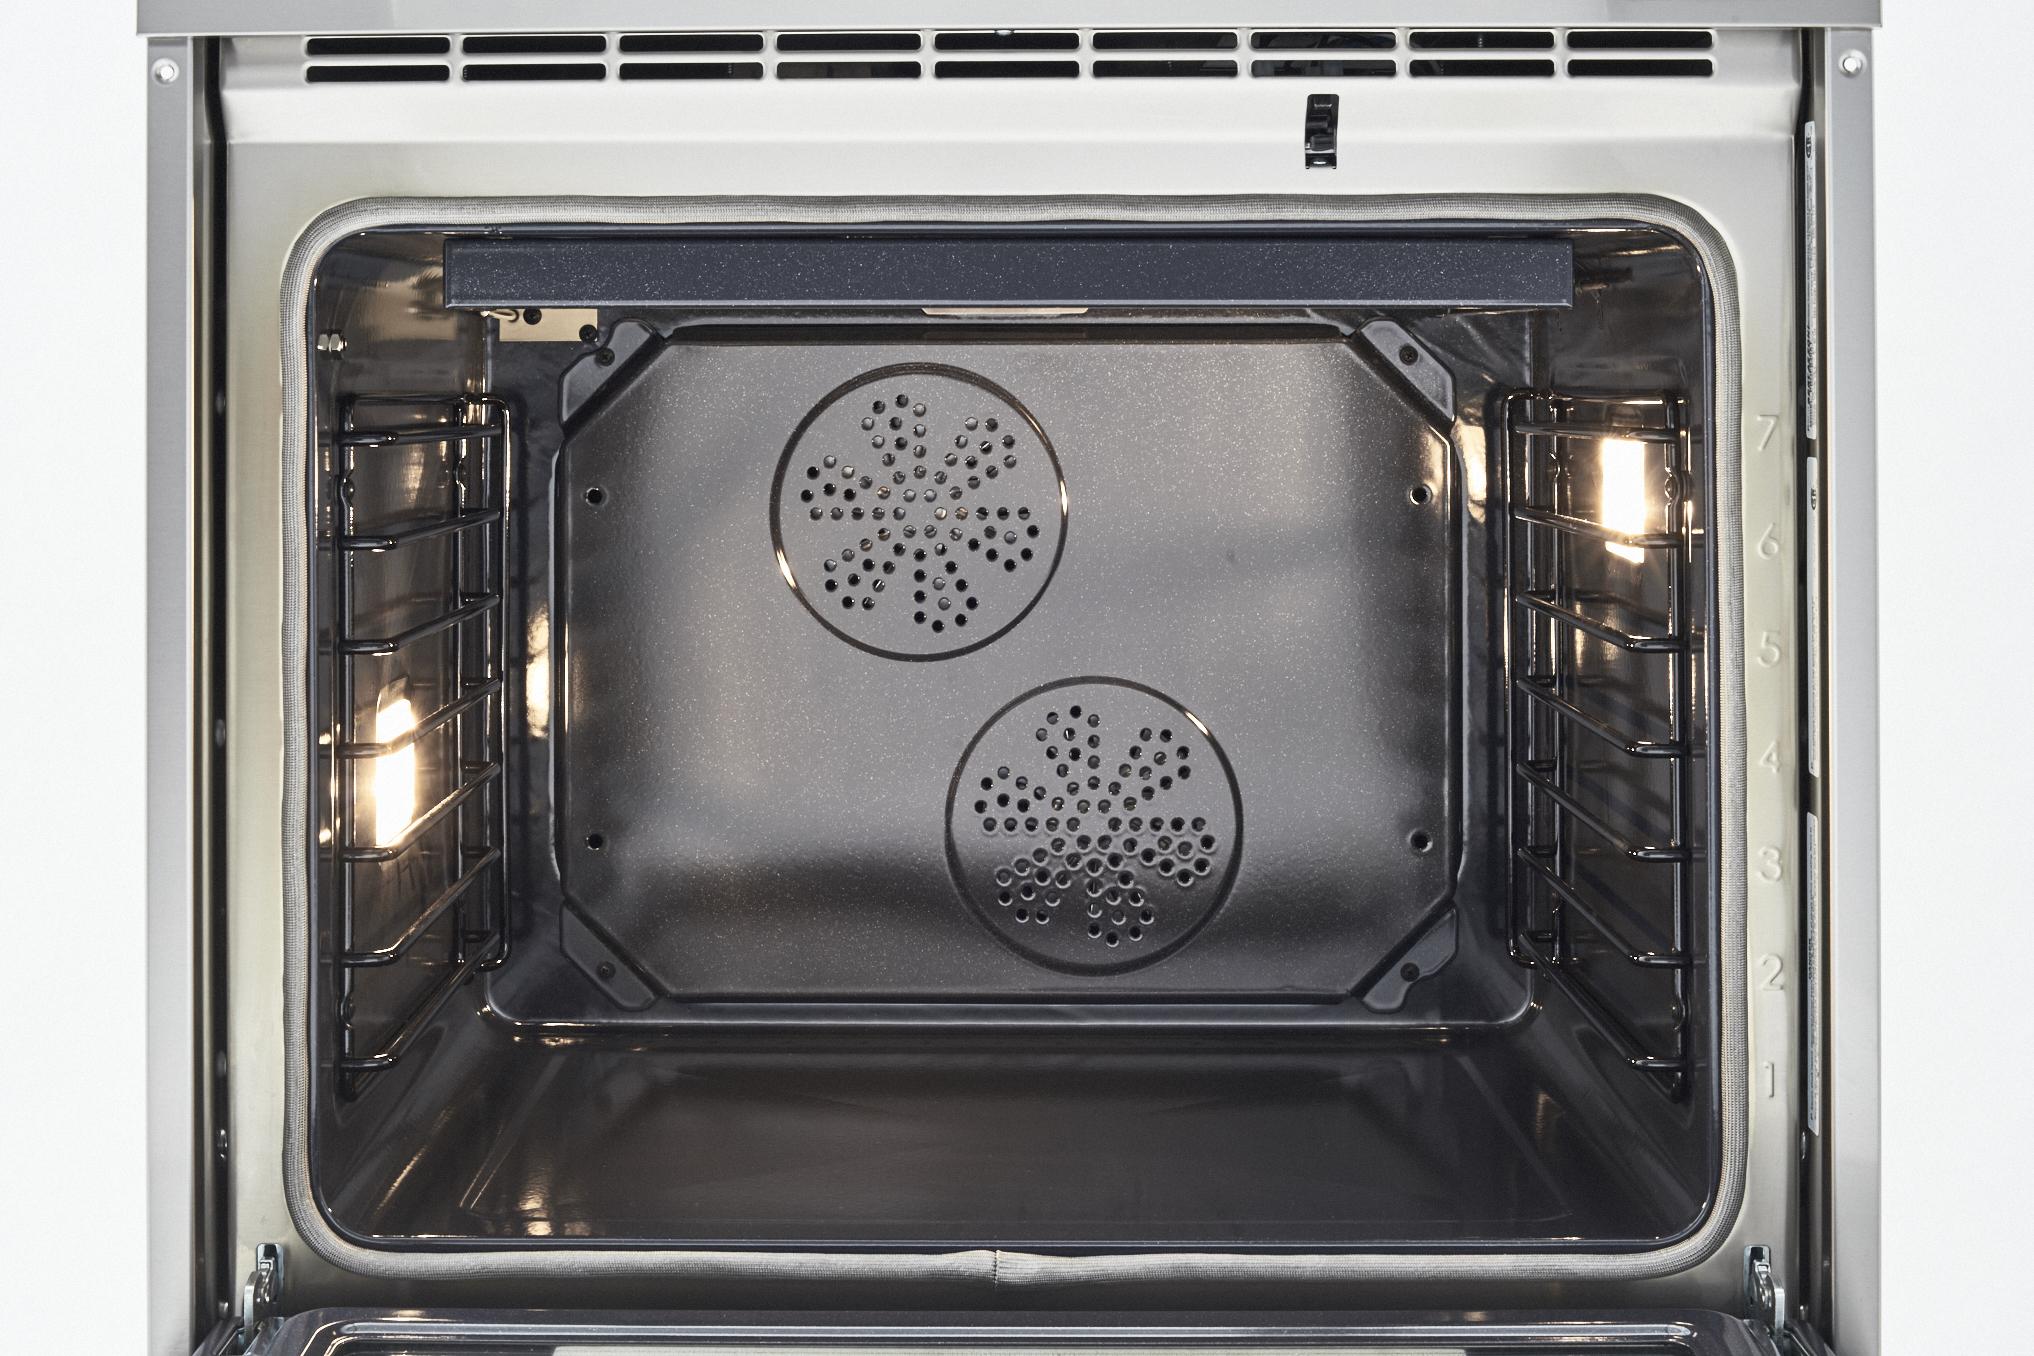 "Model: PROF304INSBIT | Bertazzoni 30"" Professional Series range - Electric self clean oven - 4 induction zones"